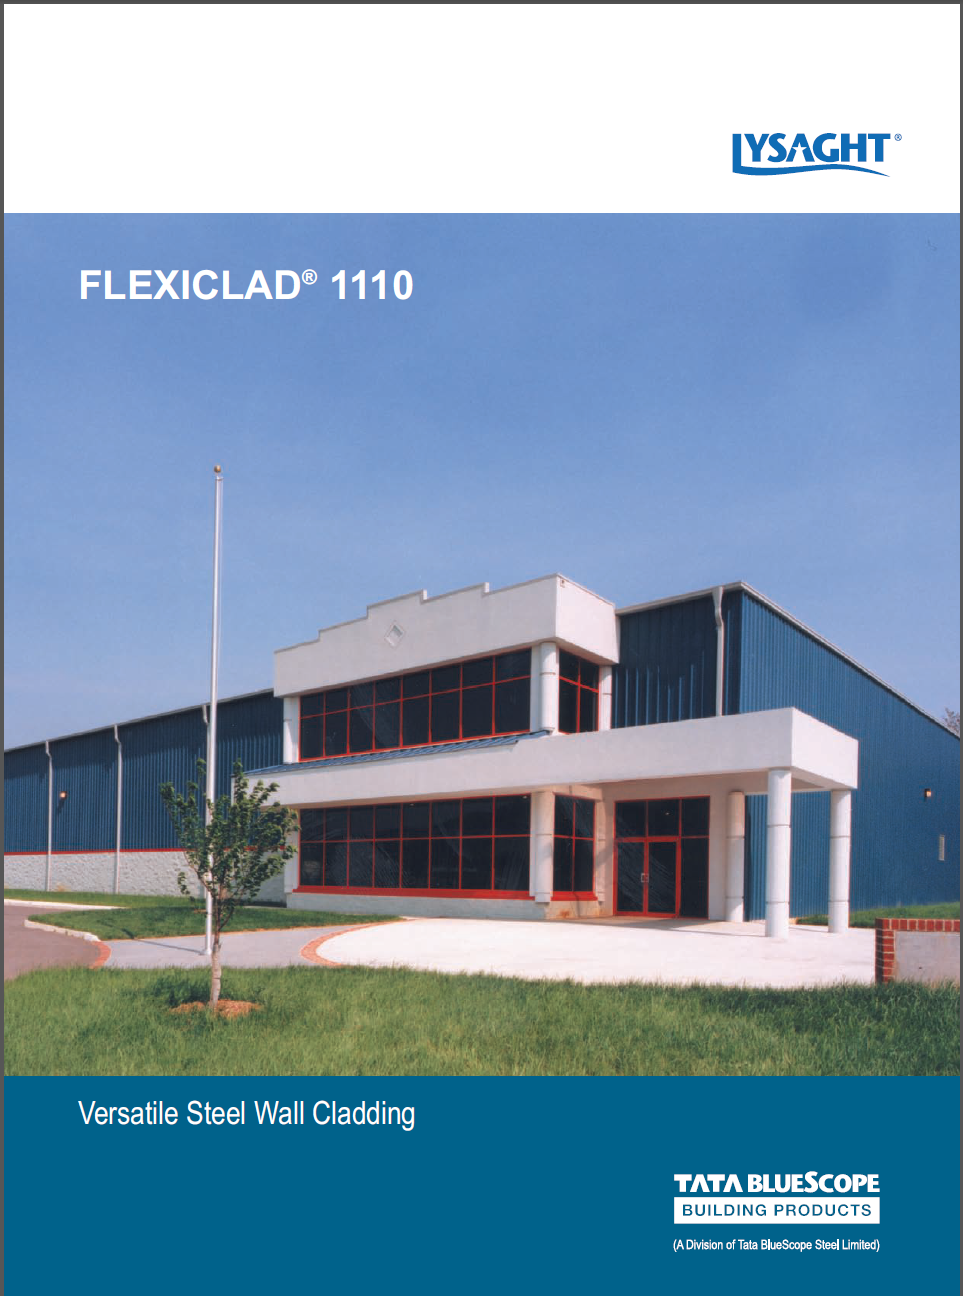 flexiclad_1